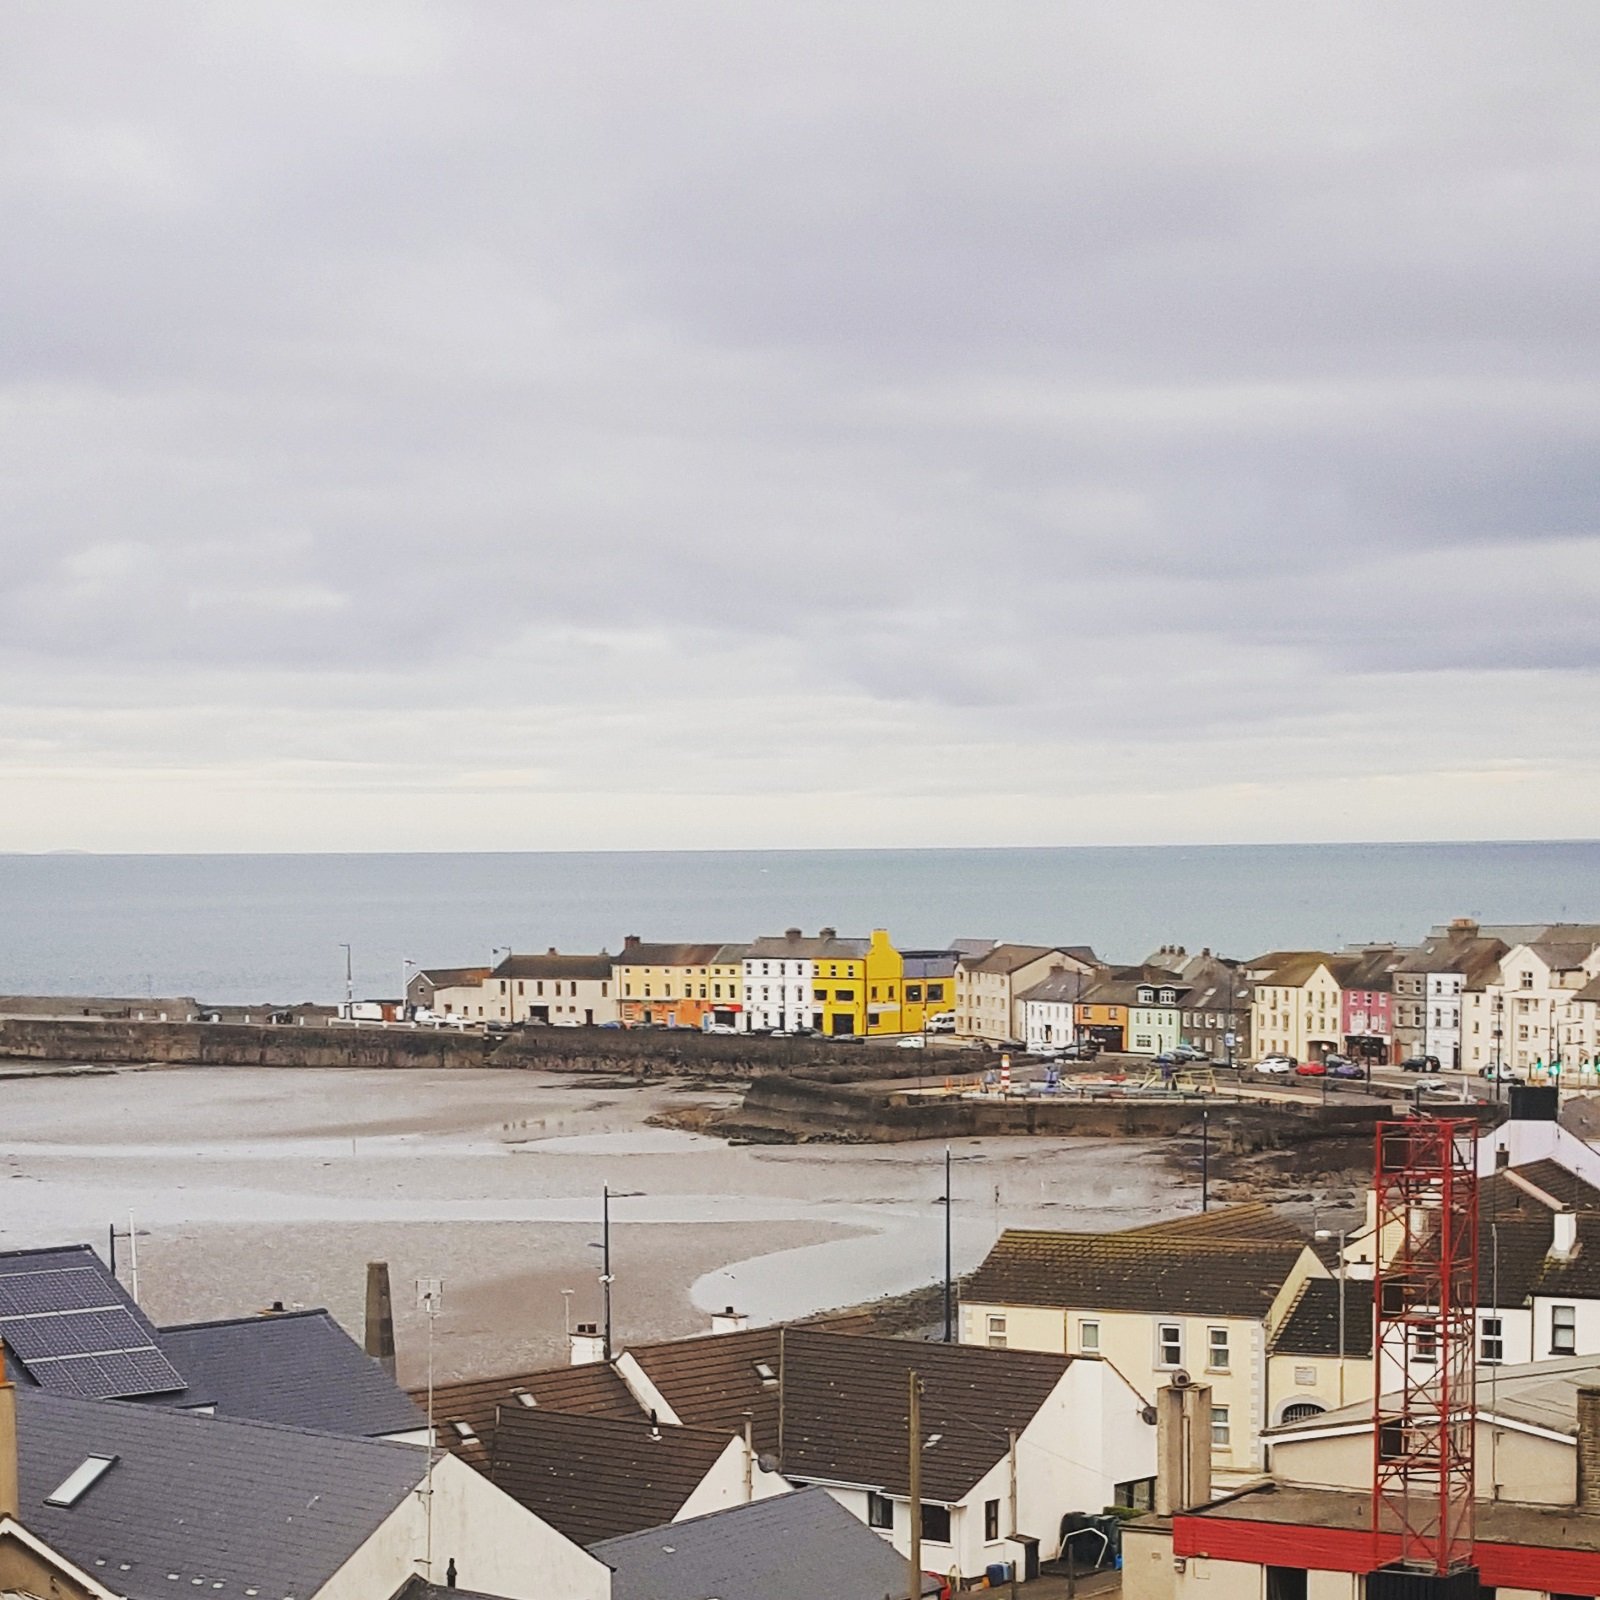 Donaghadee, Pohjois-Irlanti